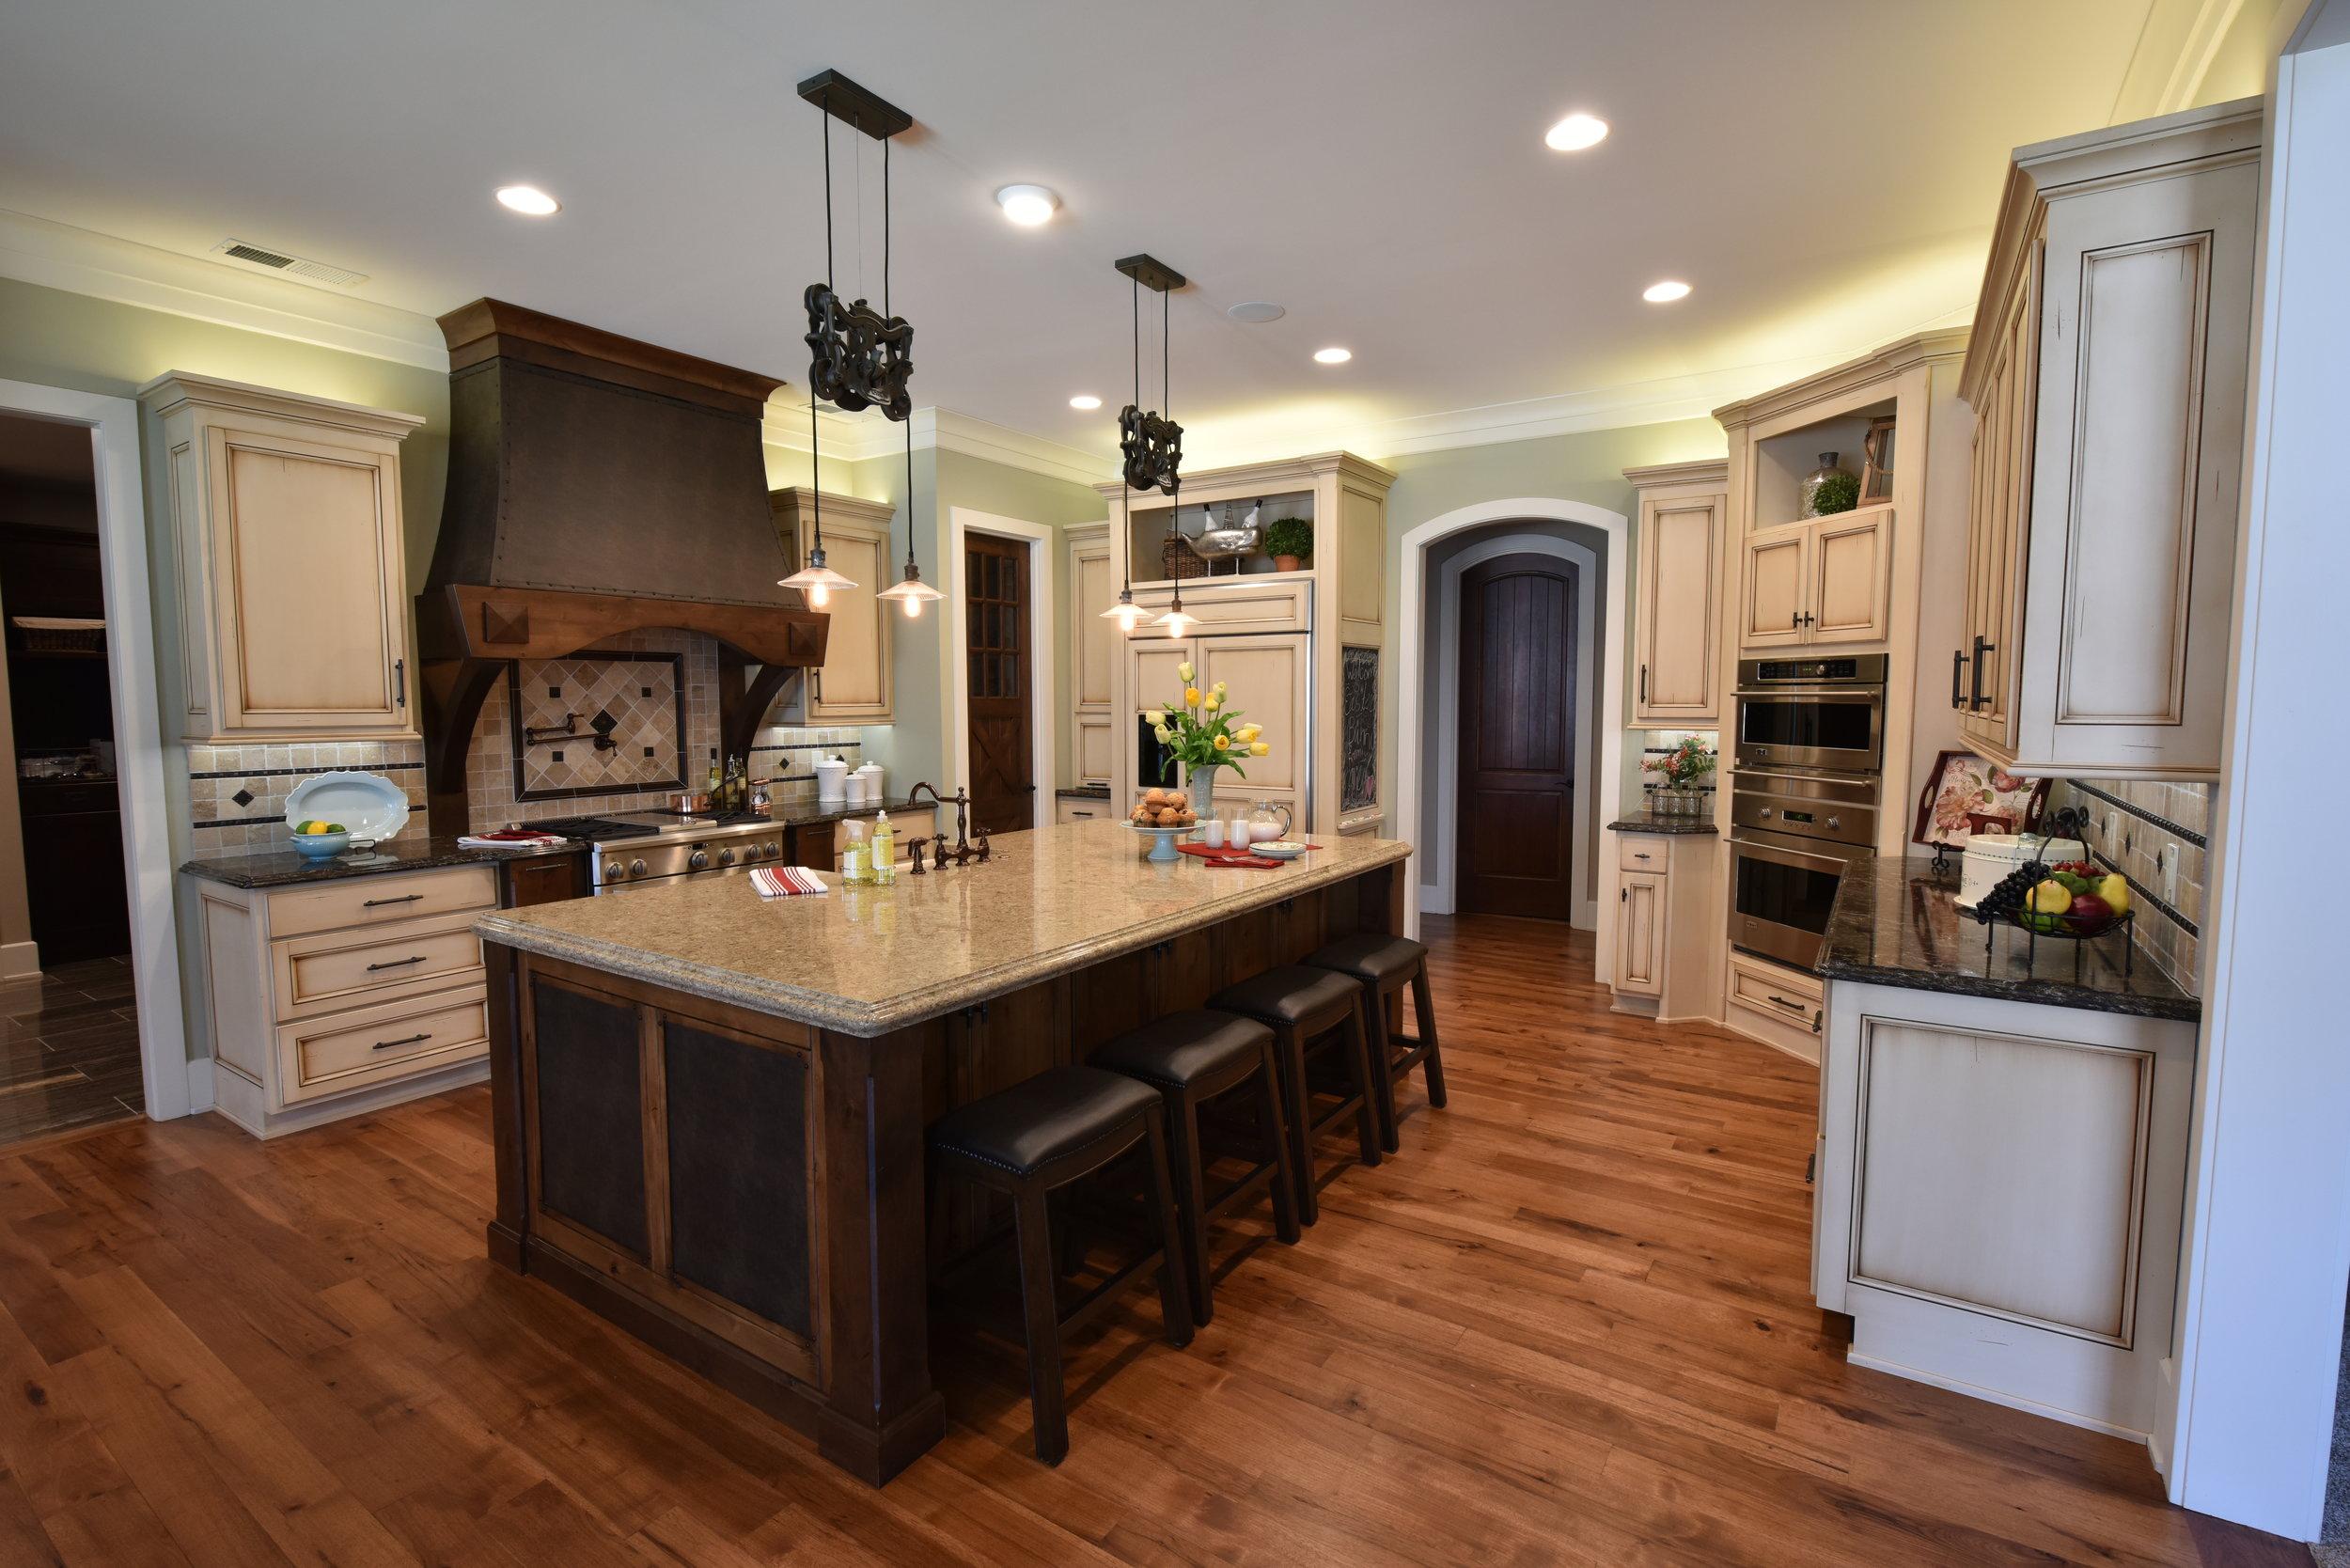 sturdy kitchen cabinets